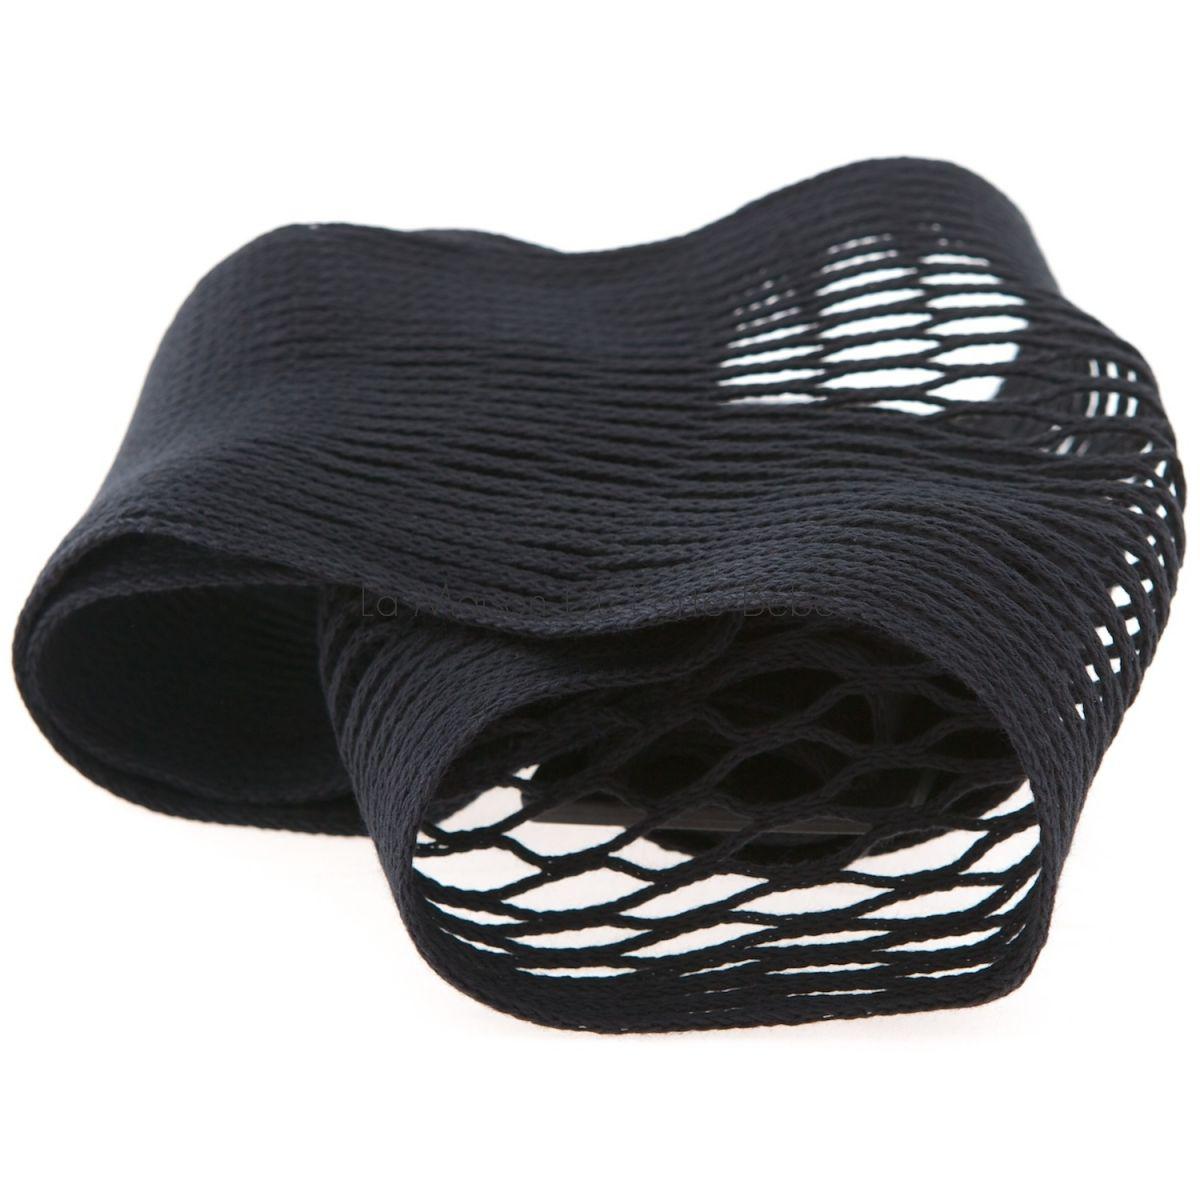 echarpe porte b b d 39 appoint tailles sebio. Black Bedroom Furniture Sets. Home Design Ideas